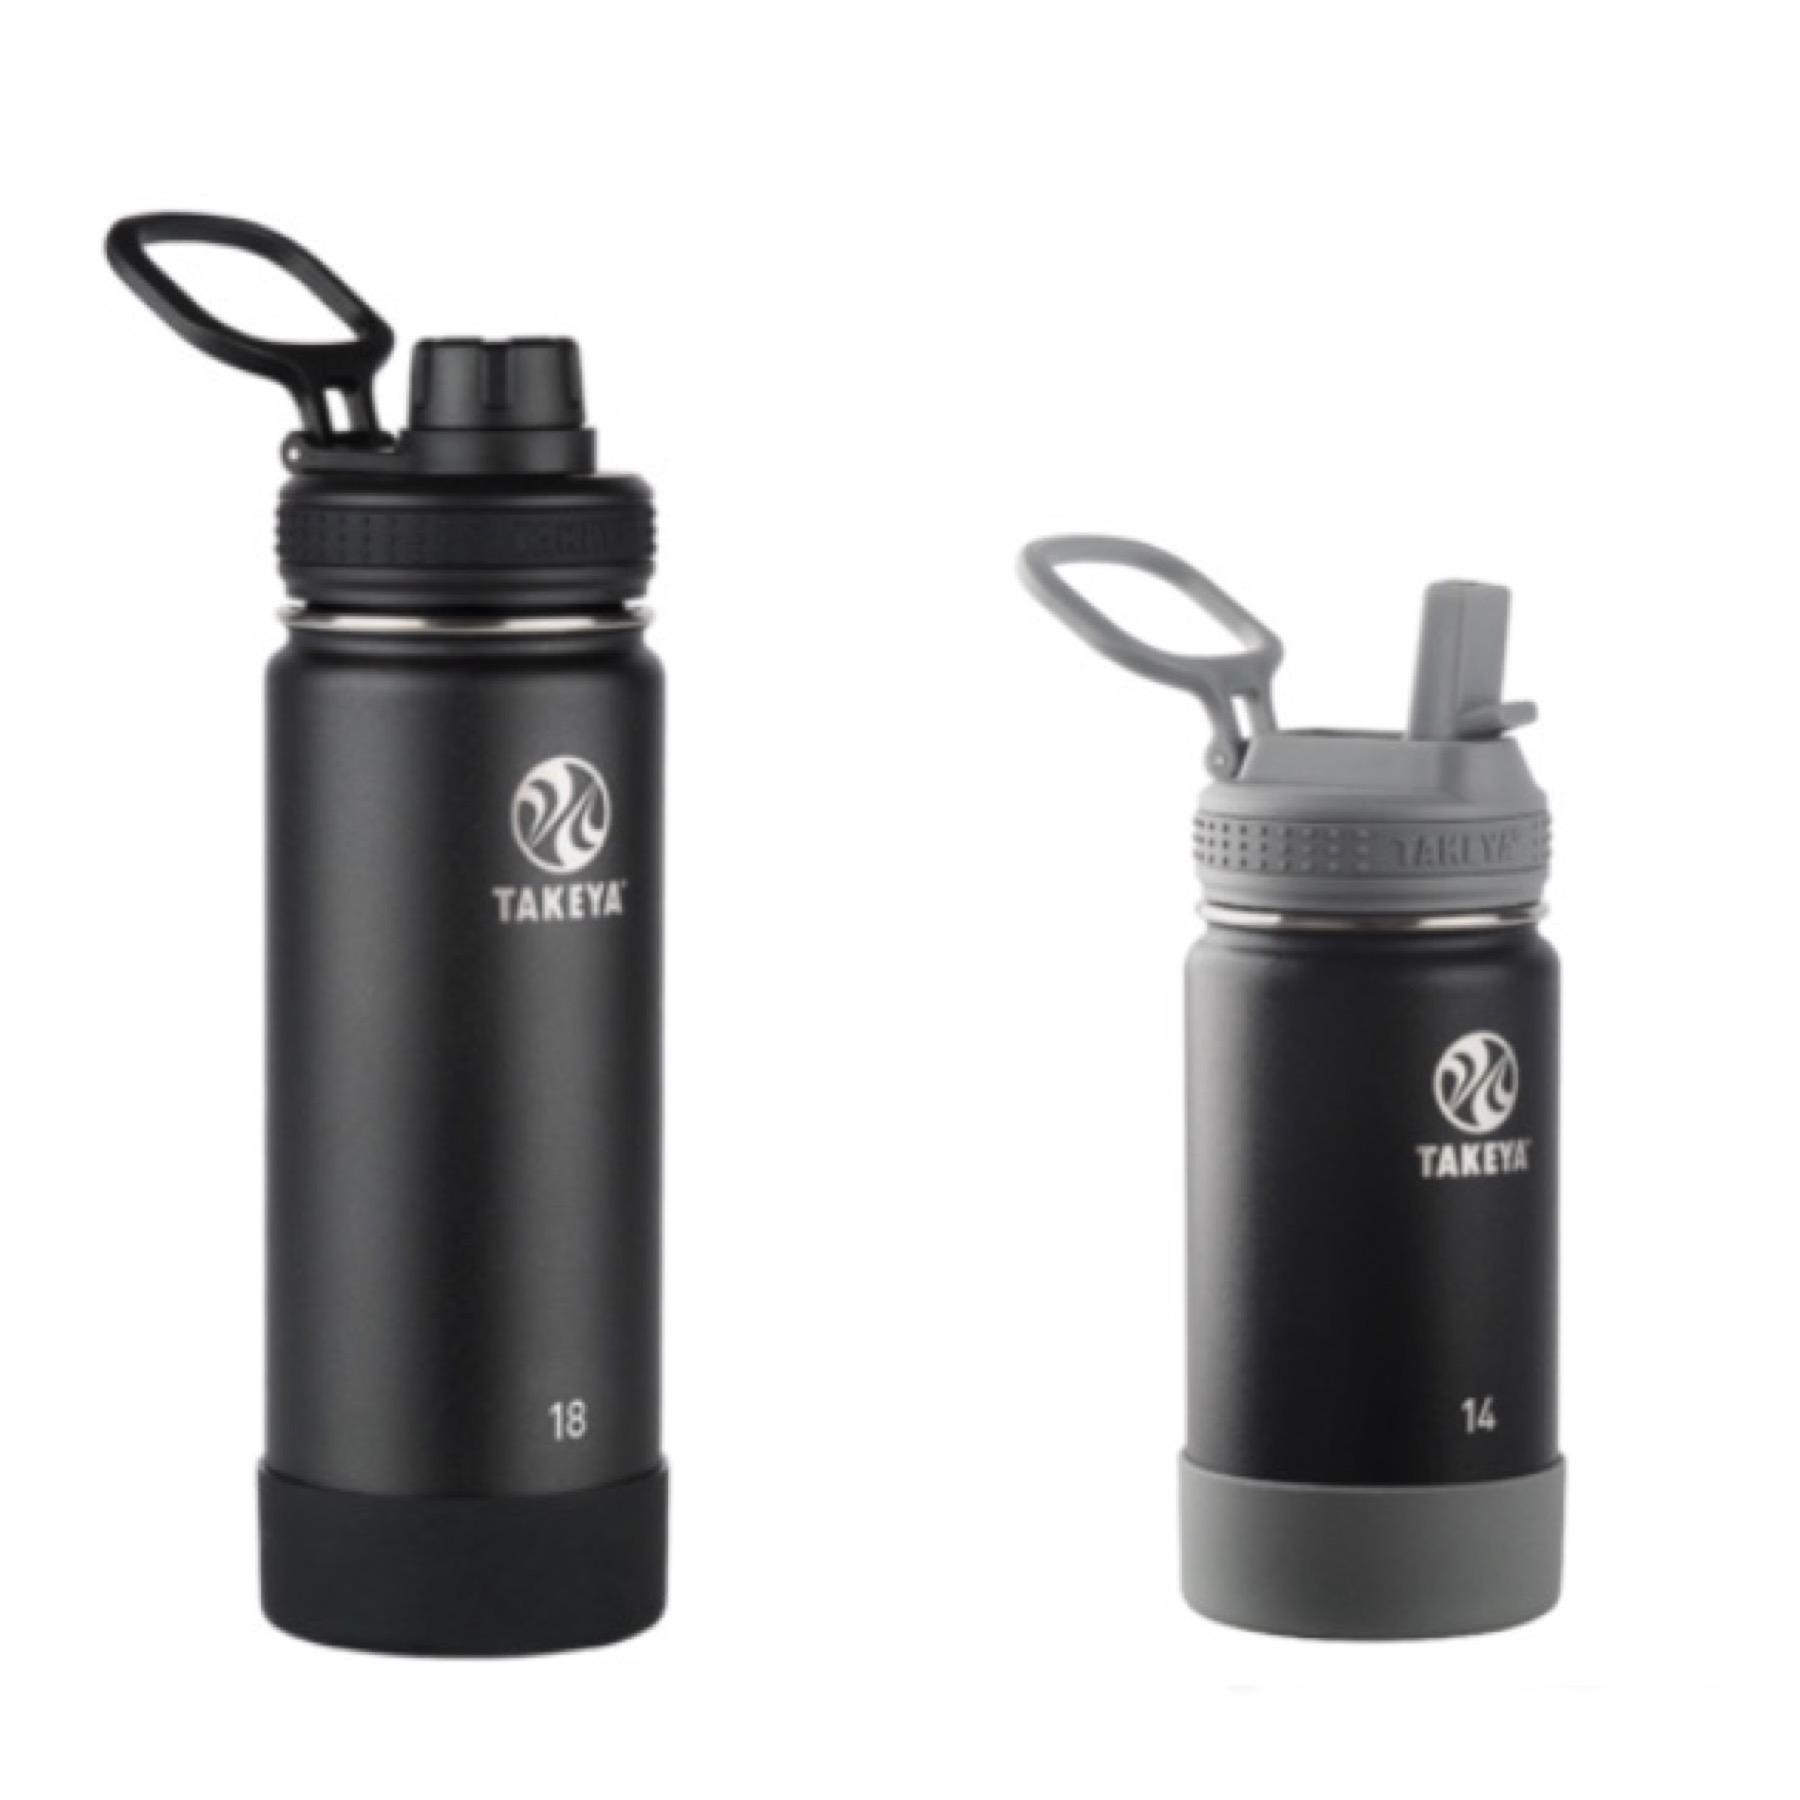 Takeya Stainless Steel Water Bottles: B1G1 Free: 14-oz Water Bottle w/ Straw Lid + 18-oz Actives Water Bottle (onyx) $25 ($12.50 each) & More + Free Shipping